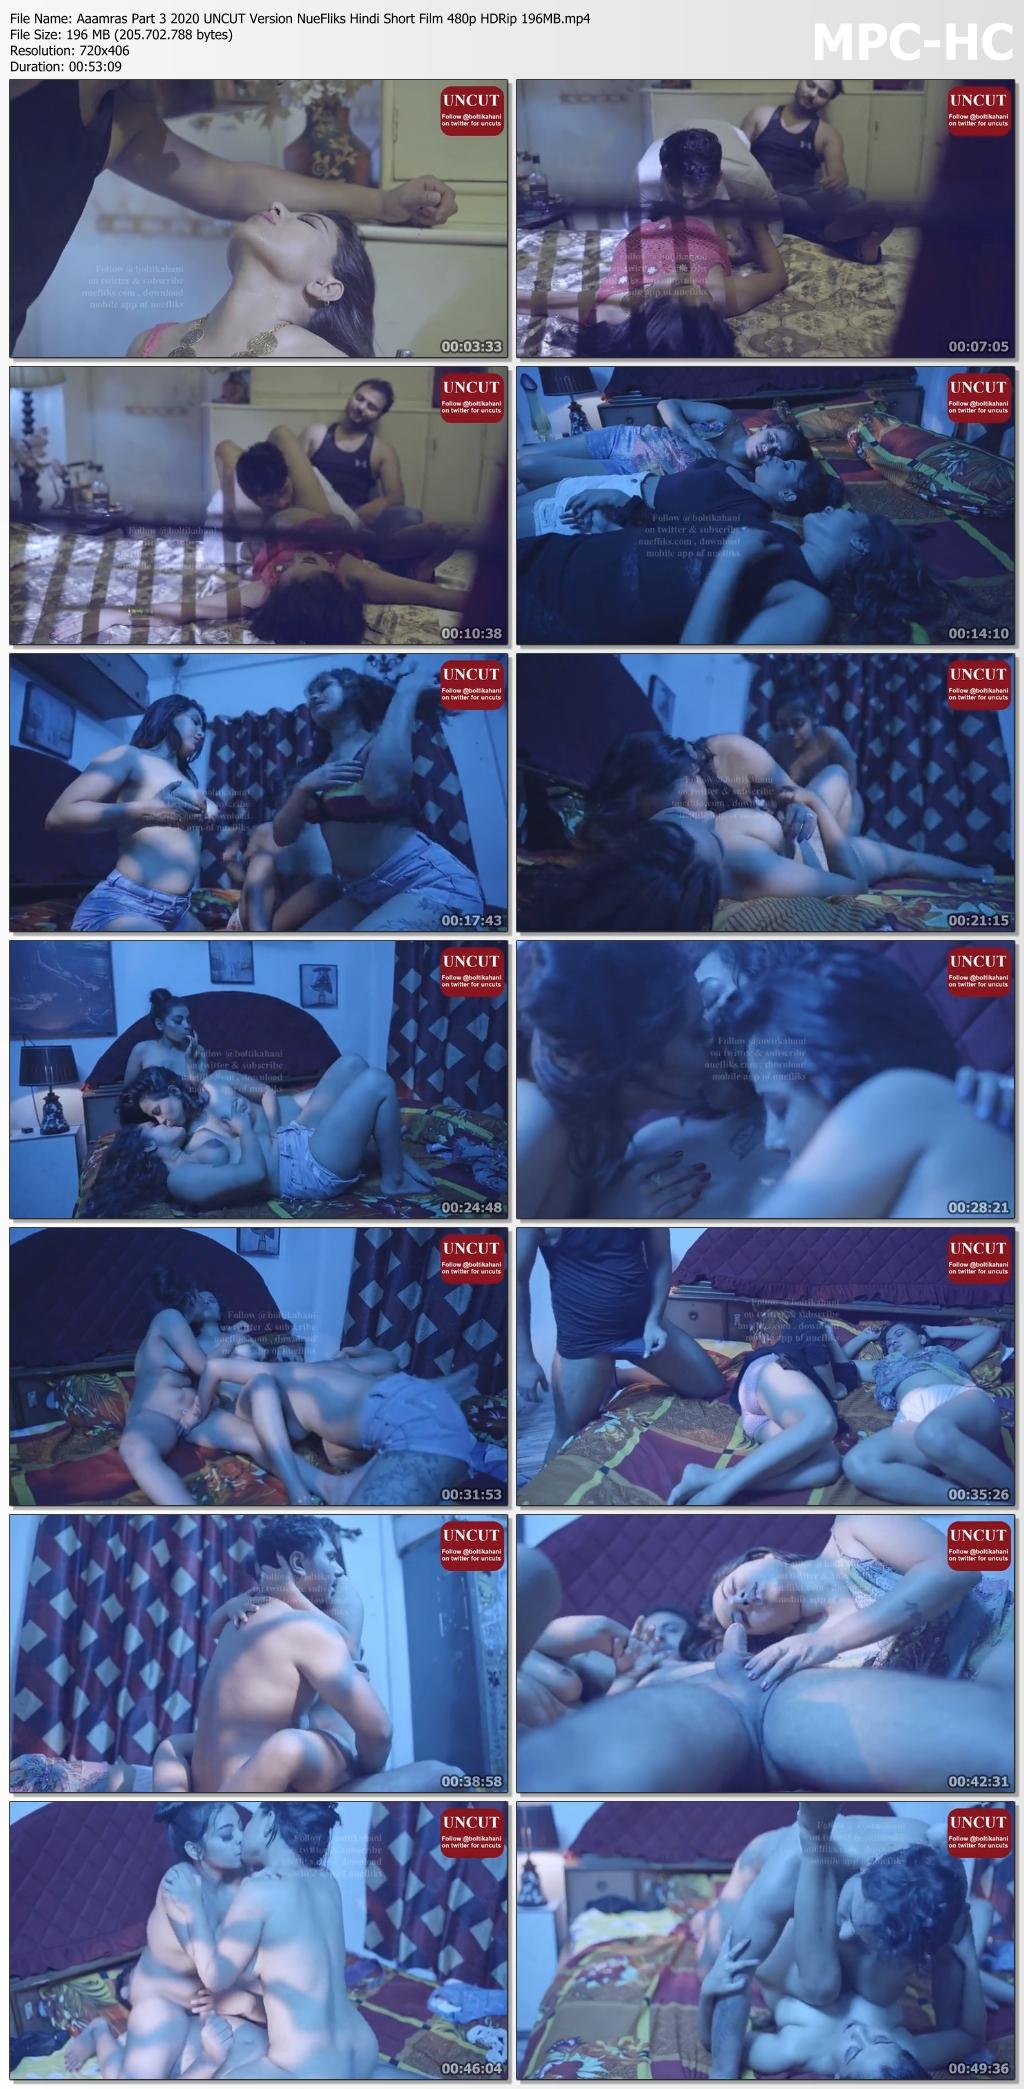 Aaamras-Part-3-2020-UNCUT-Version-Nue-Fliks-Hindi-Short-Film-480p-HDRip-196-MB-mp4-thumbs